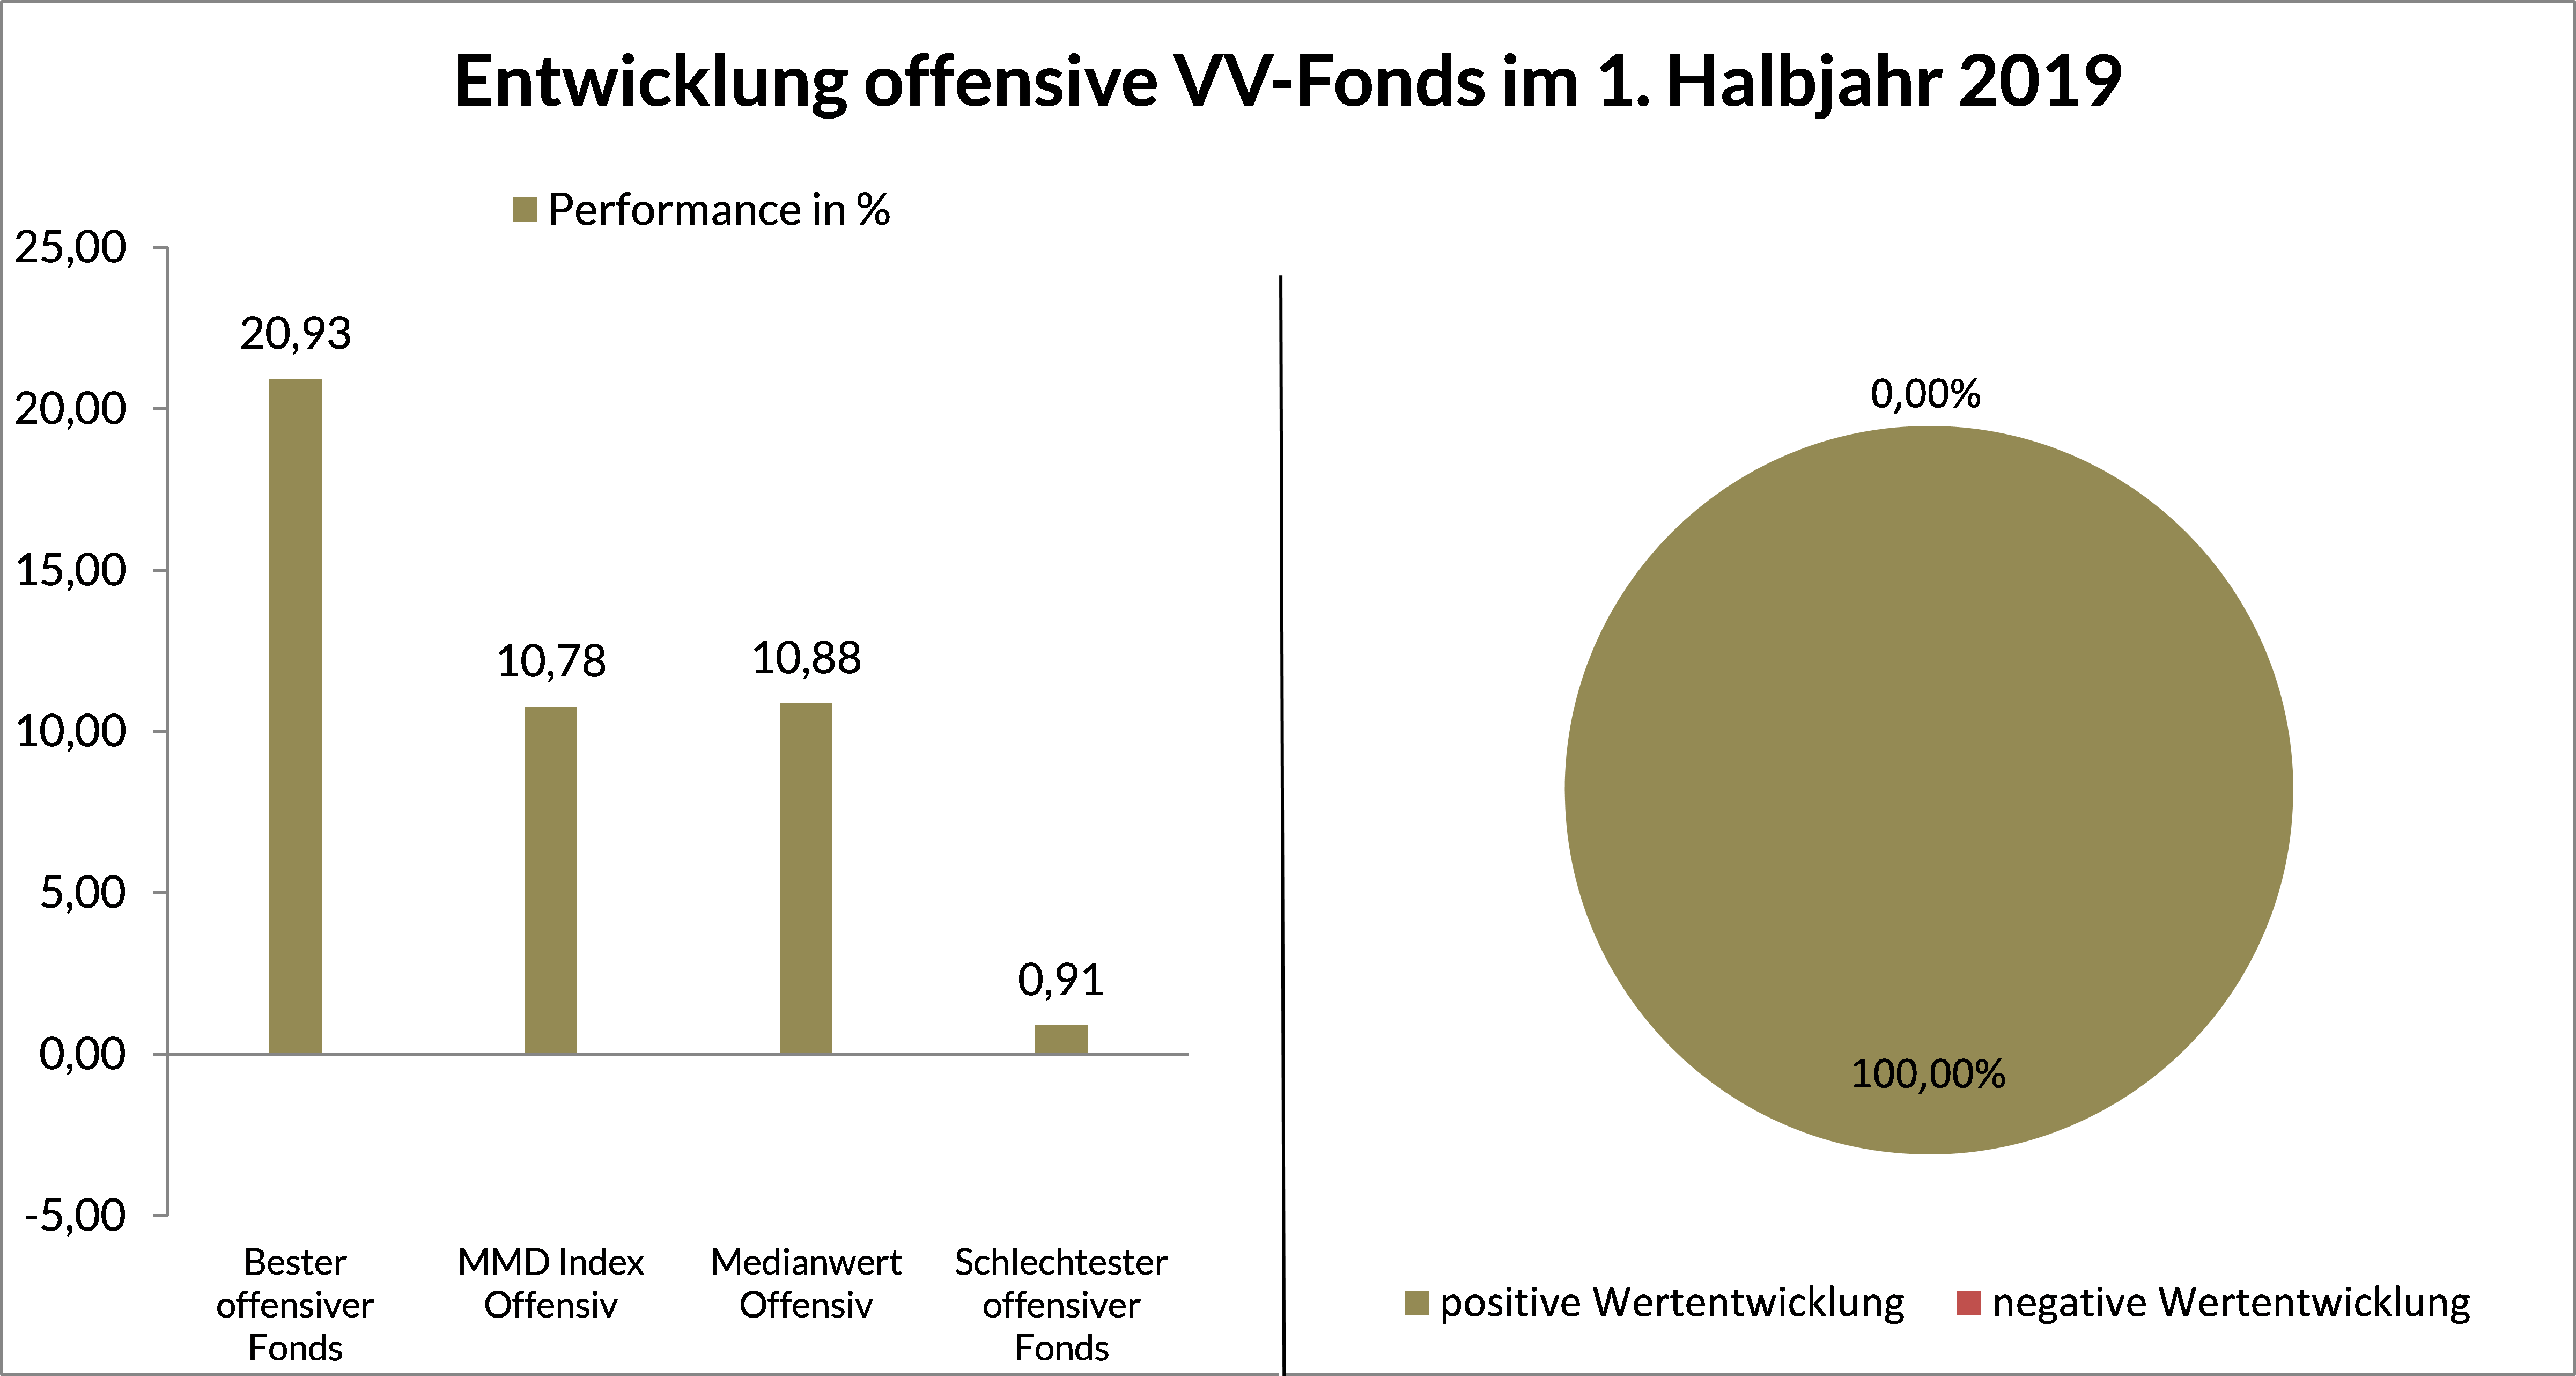 Grafik 4 - Entwicklung offensive VV-Fonds HJ 1 2019